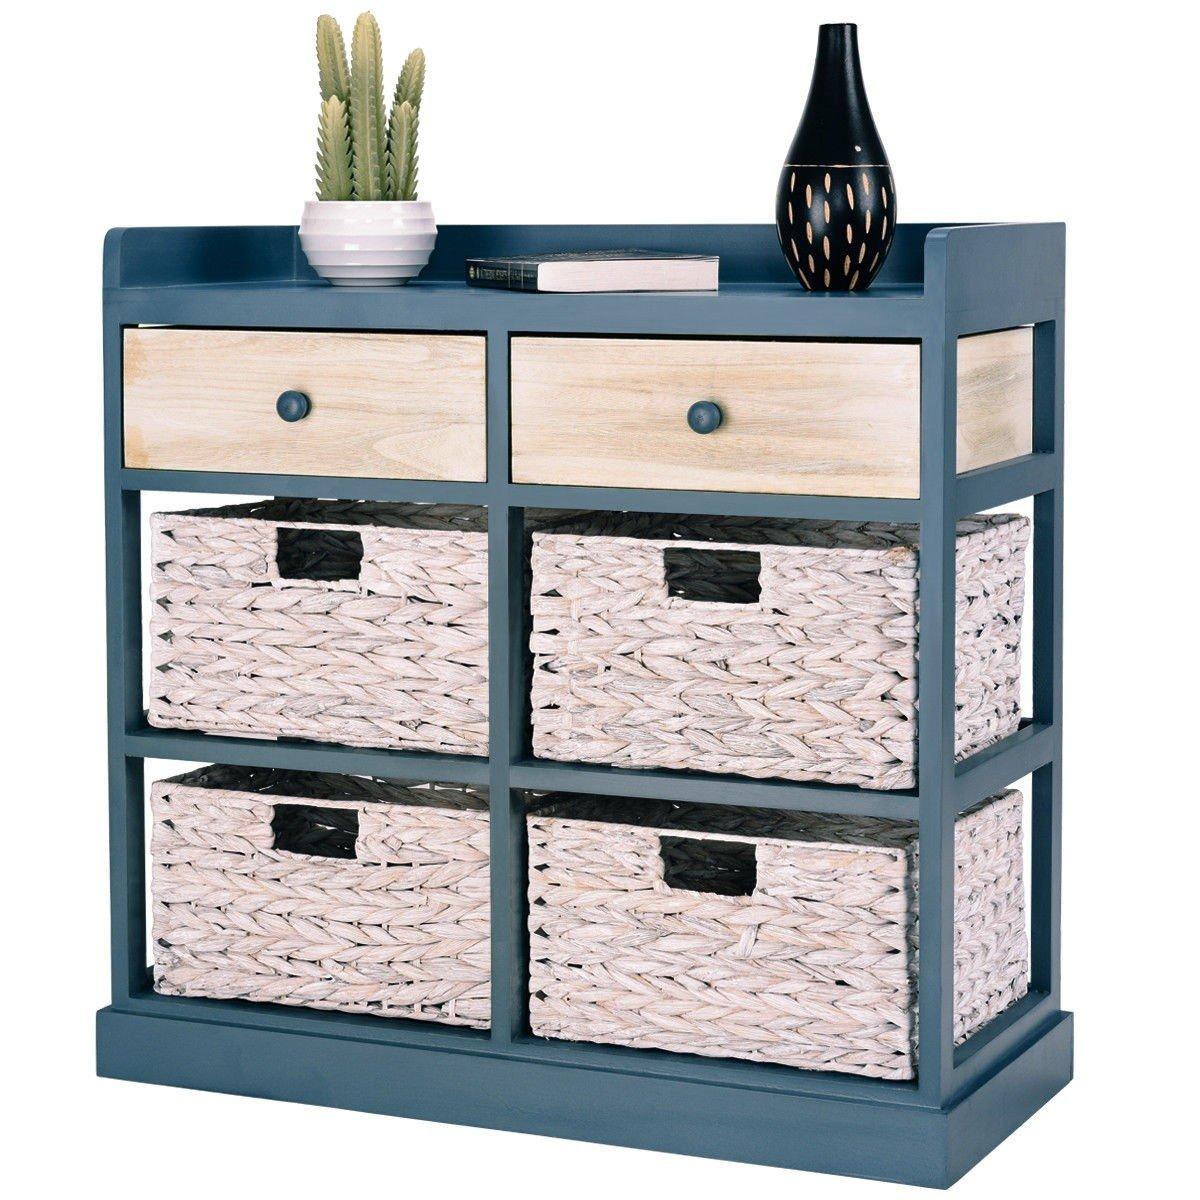 BESTChoiceForYou Cabinet Table Storage Side Wood Drawers Console Sideboard Cupboard W Furniture End Vidaxl White Baskets Drawer Door Home by BESTChoiceForYou (Image #1)